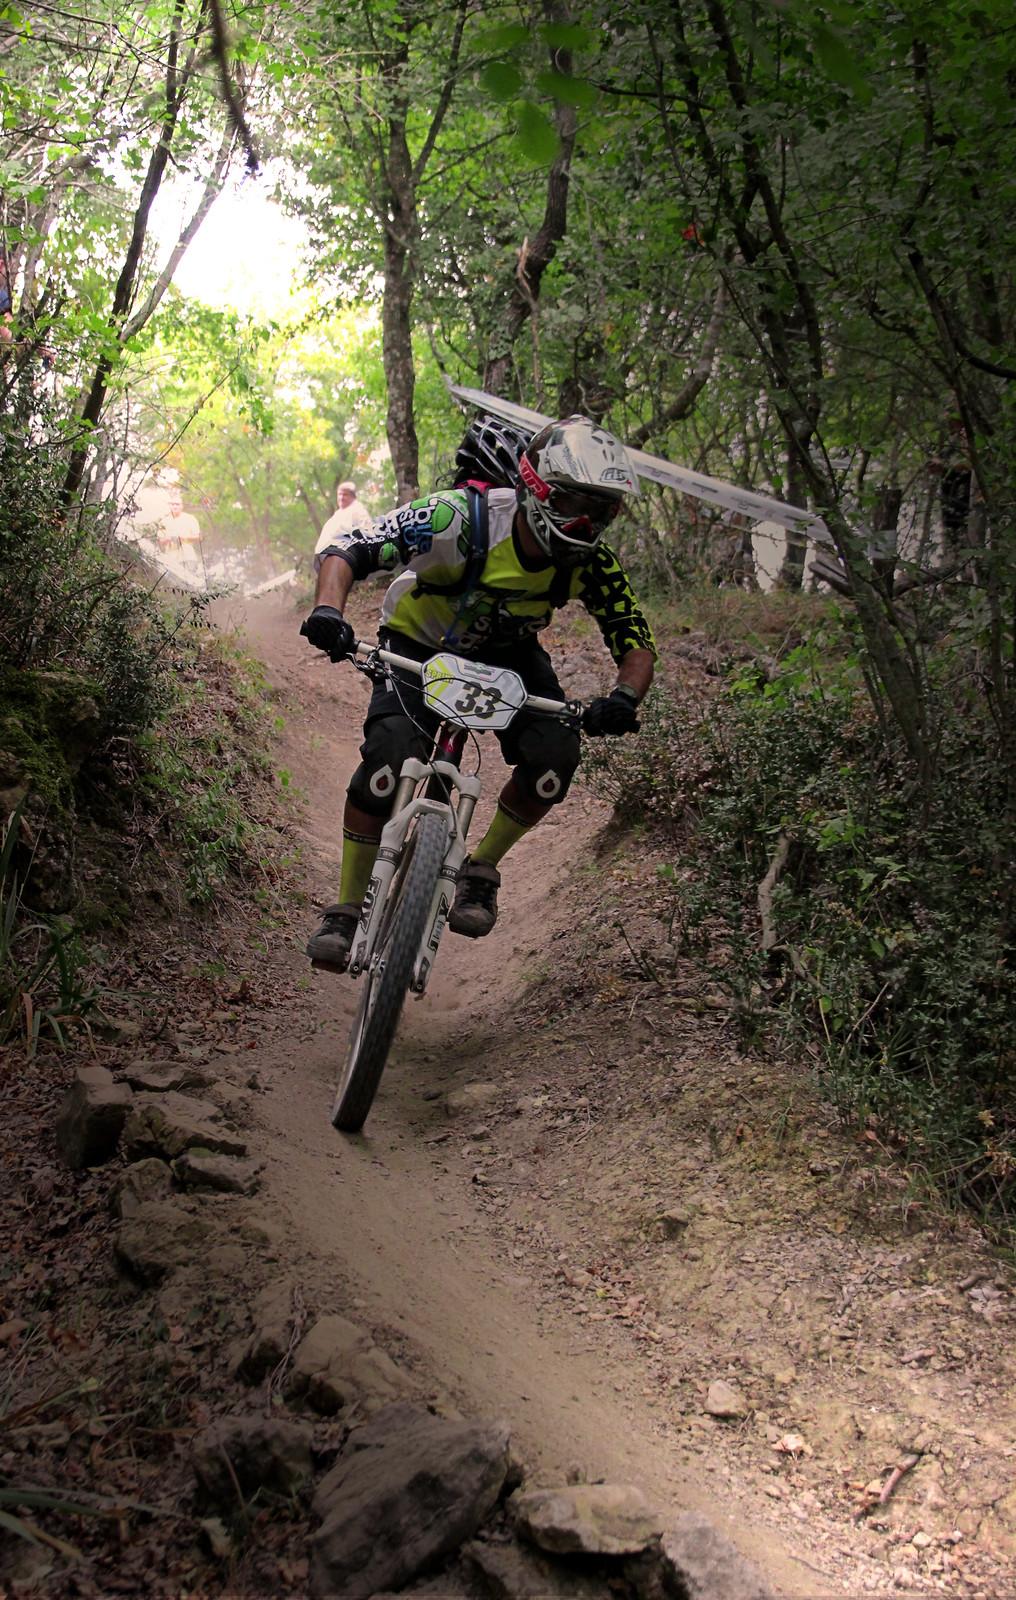 Super Enduro Tolfa 06 - Ruggero - Mountain Biking Pictures - Vital MTB